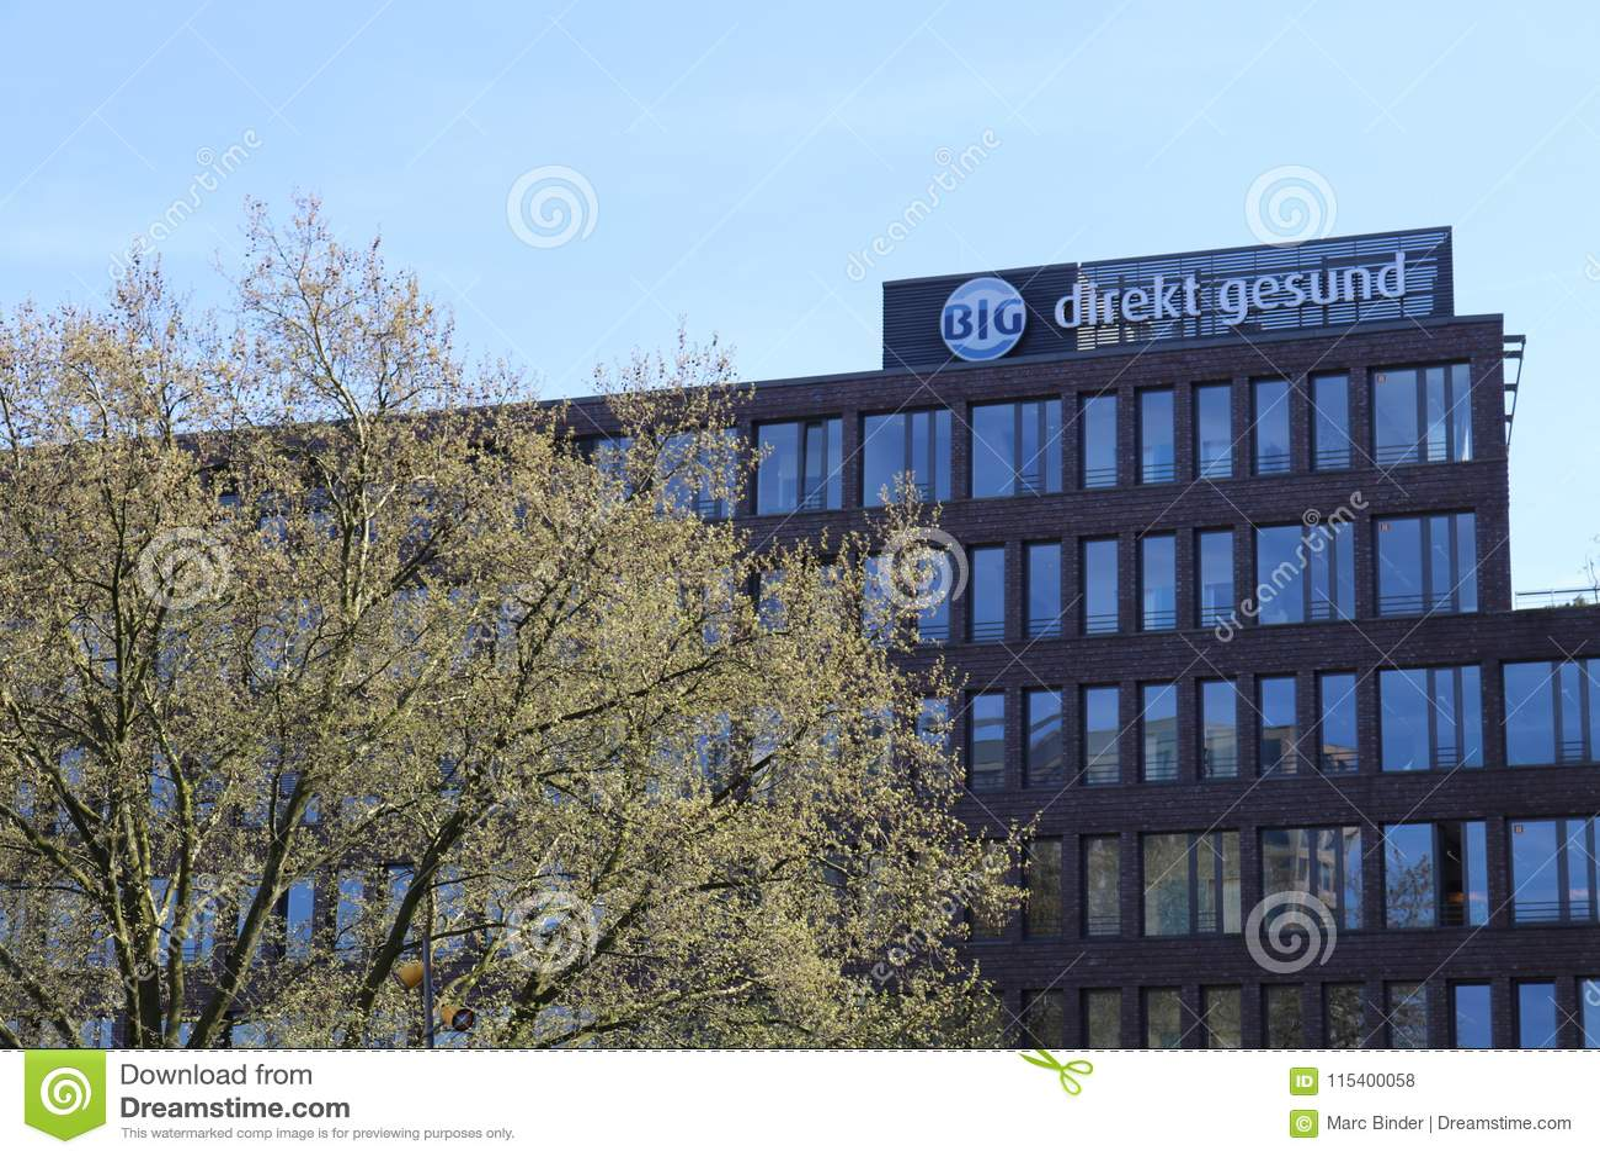 Dortmund, Ruhr Area, North Rhine Westphalia ,Germany - April 16 2018: German `Bundesinnungskrankenkasse Gesundheit` Direkt gesund